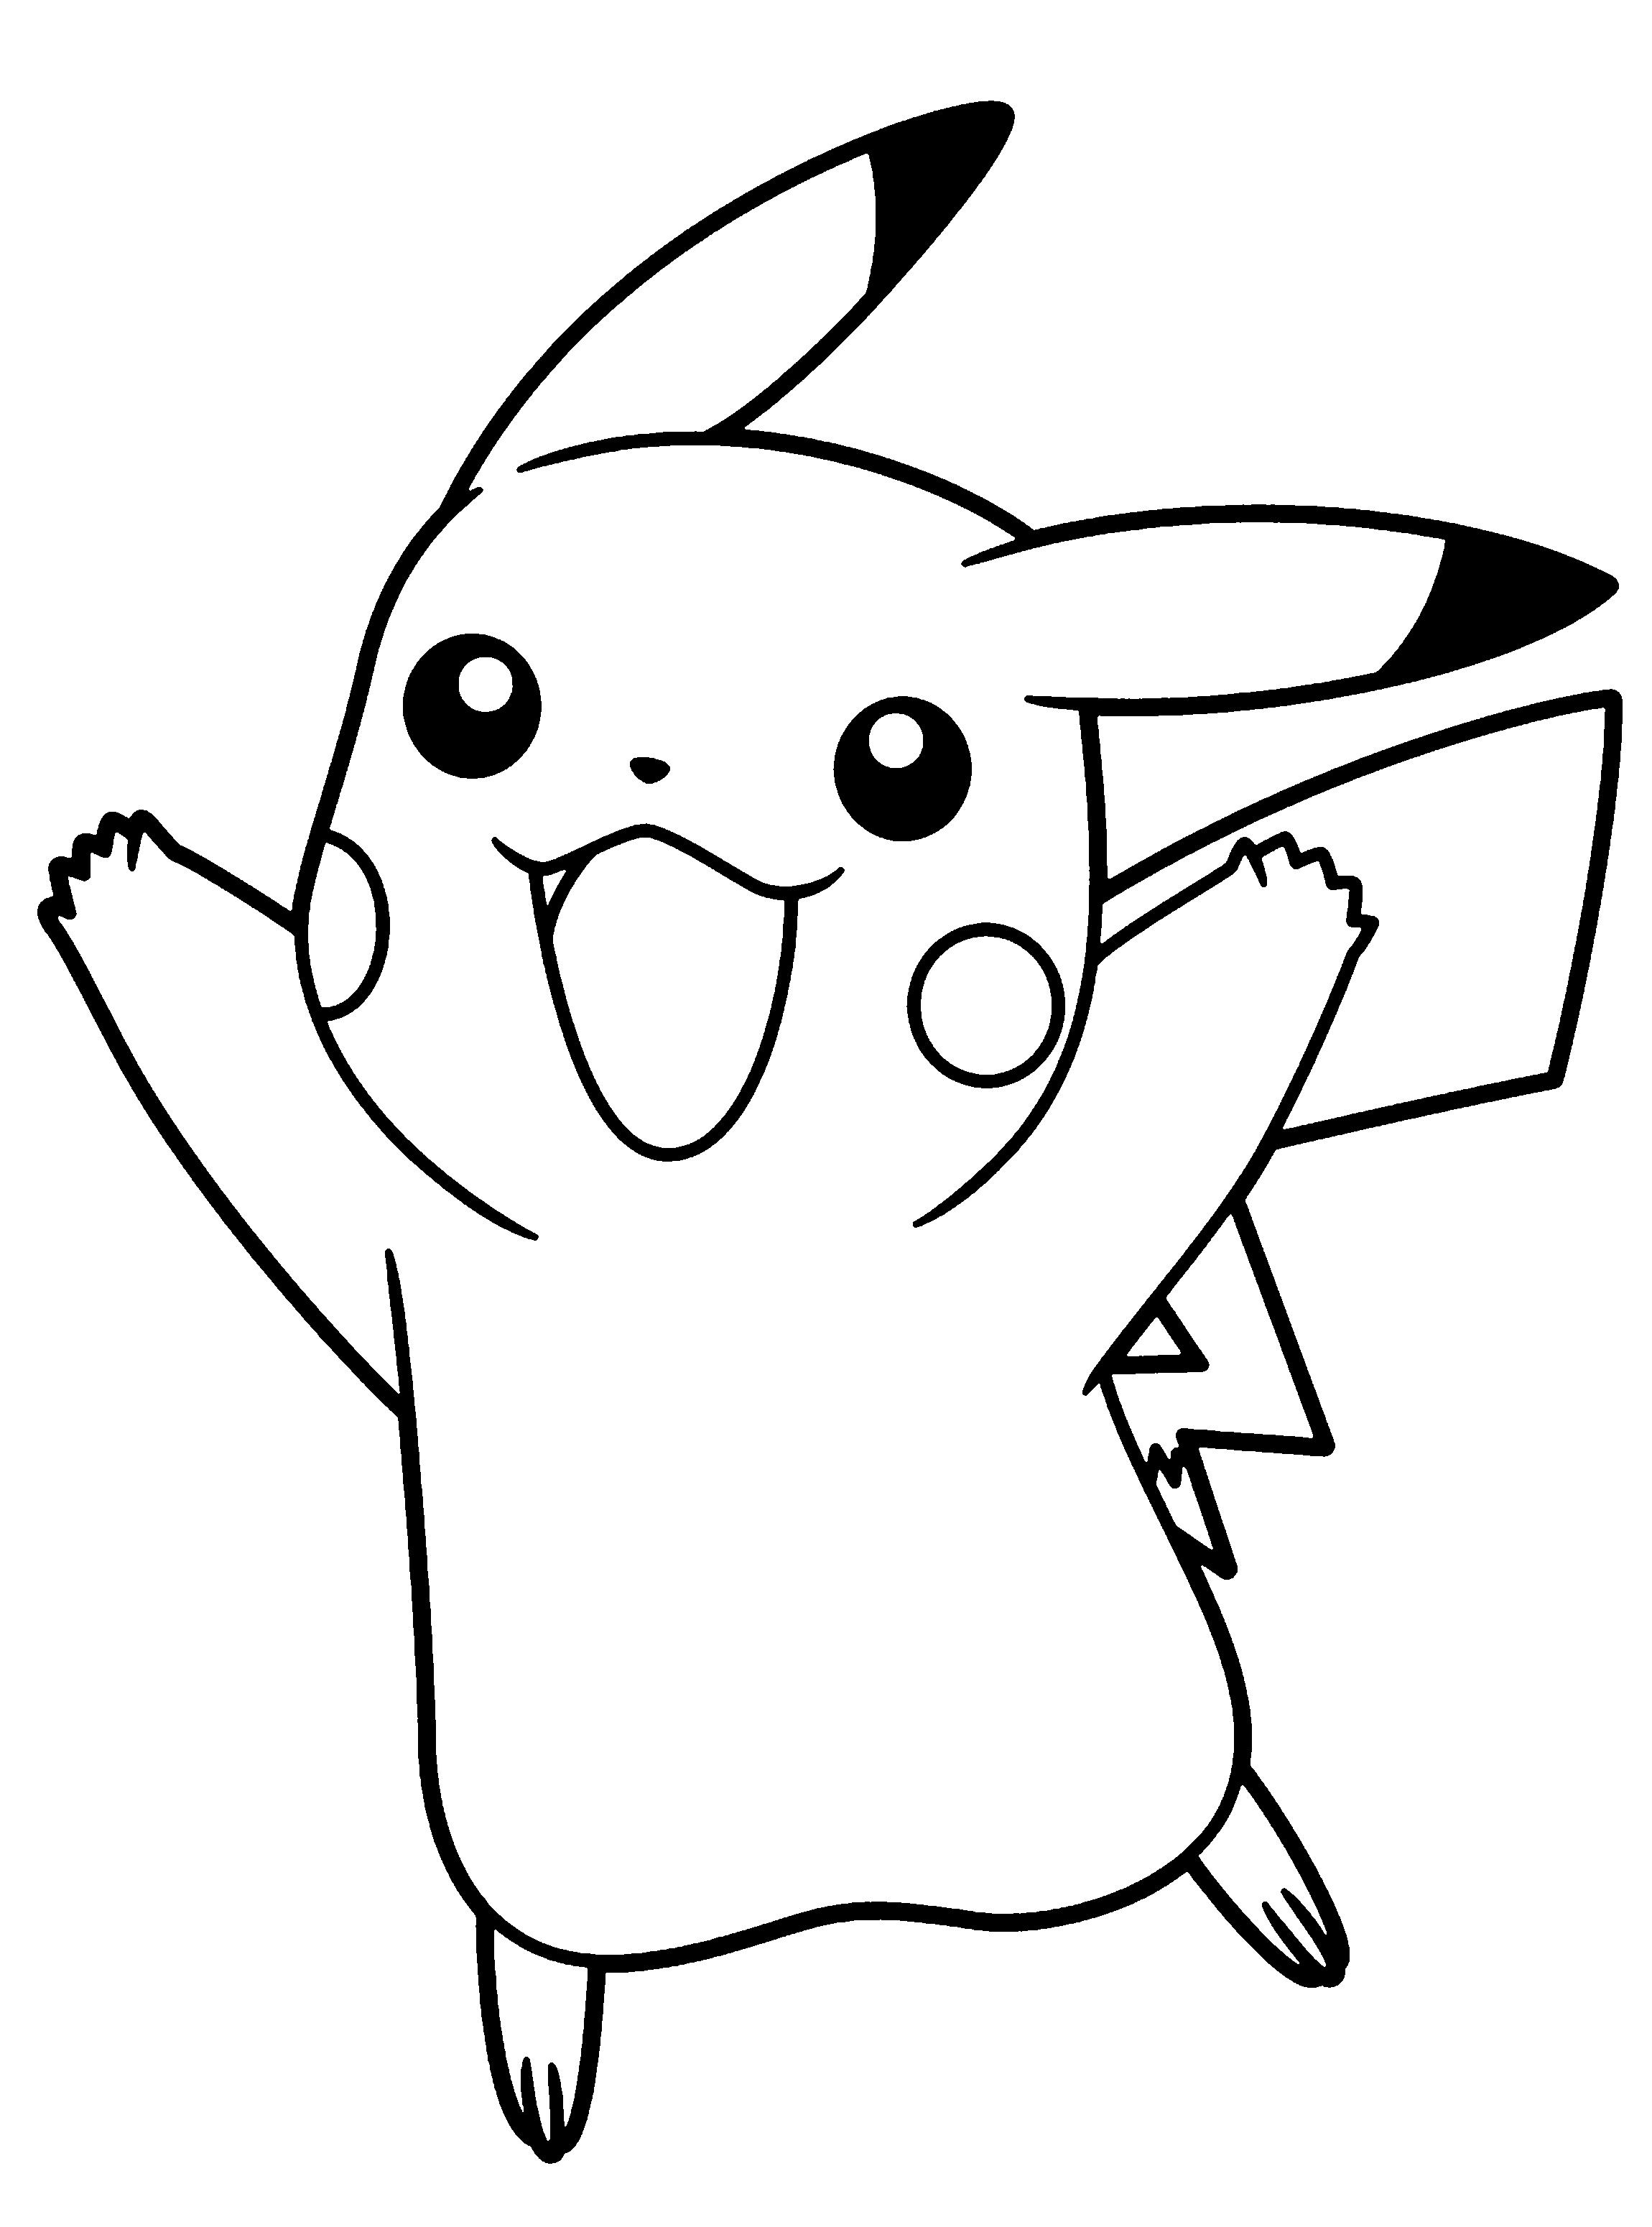 Dibujos pikachu para dibujar imprimir colorear y for Comedor facil de dibujar